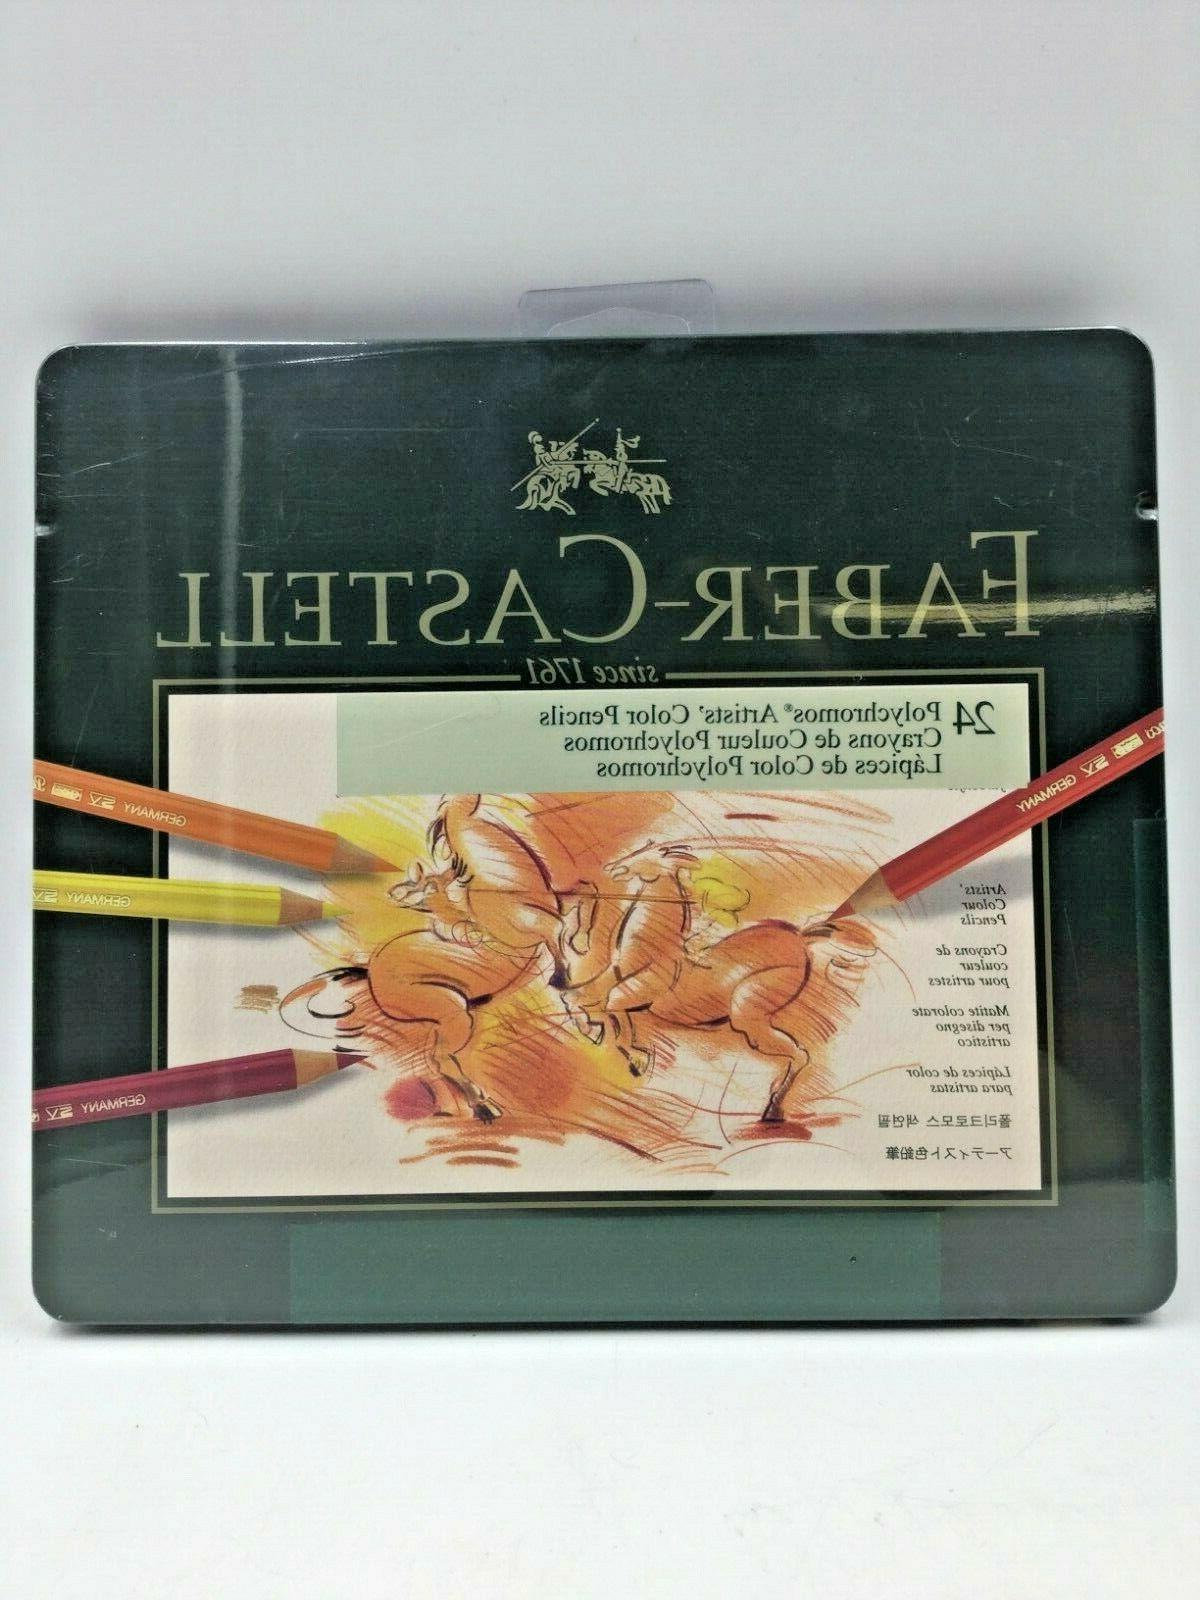 faber castell polychromos artists color pencils set